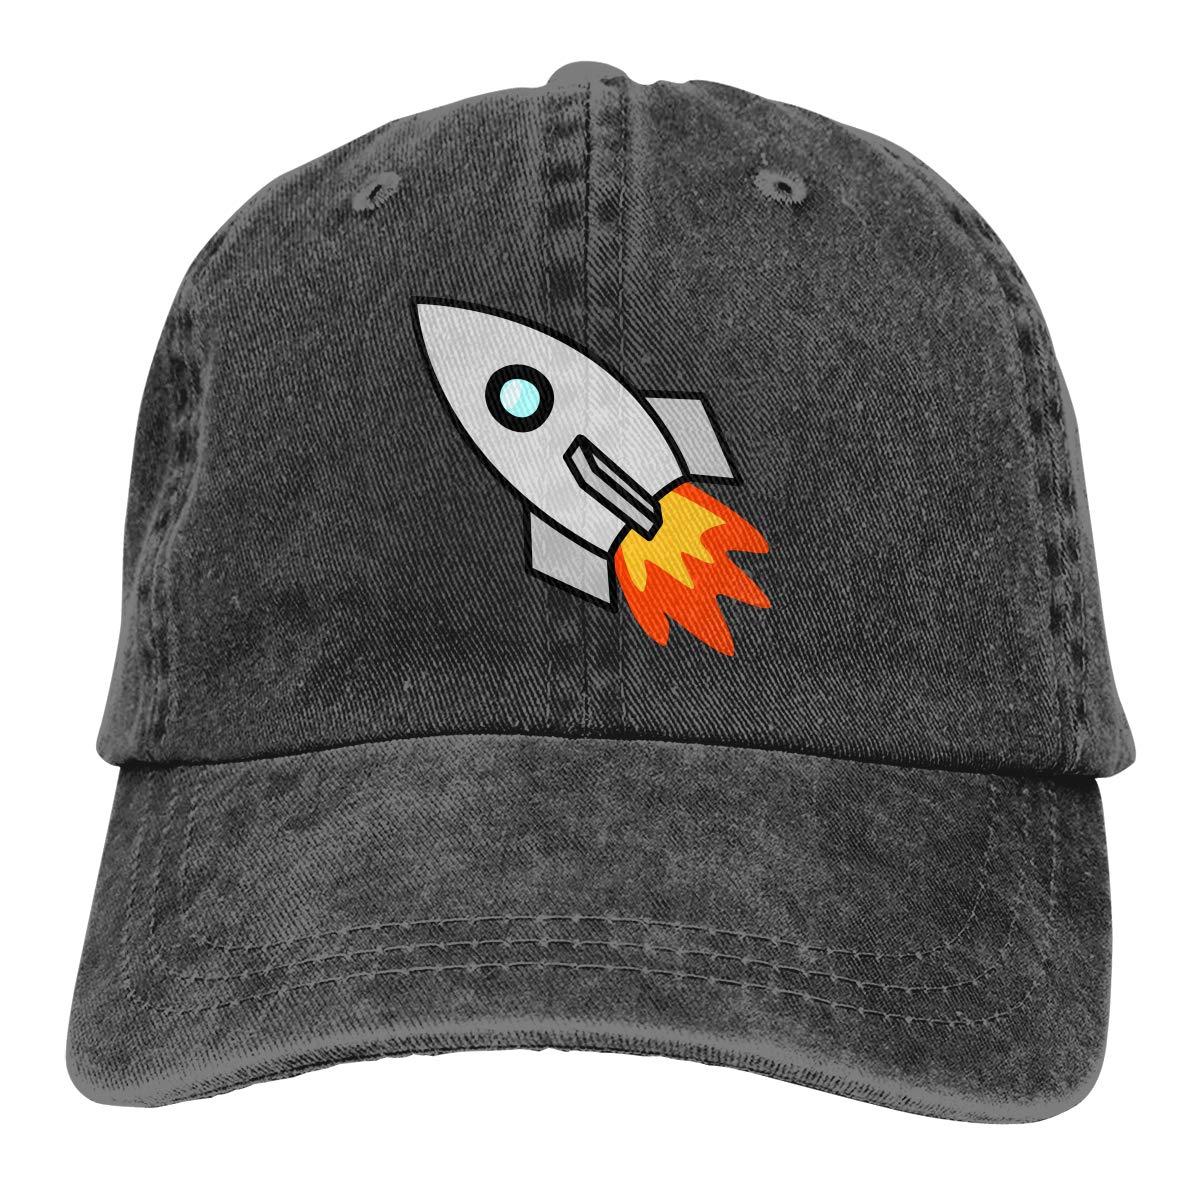 Qbeir Adult Unisex Cowboy Cap Adjustable Hat Cartoon Rocket Takeoff Cotton Denim